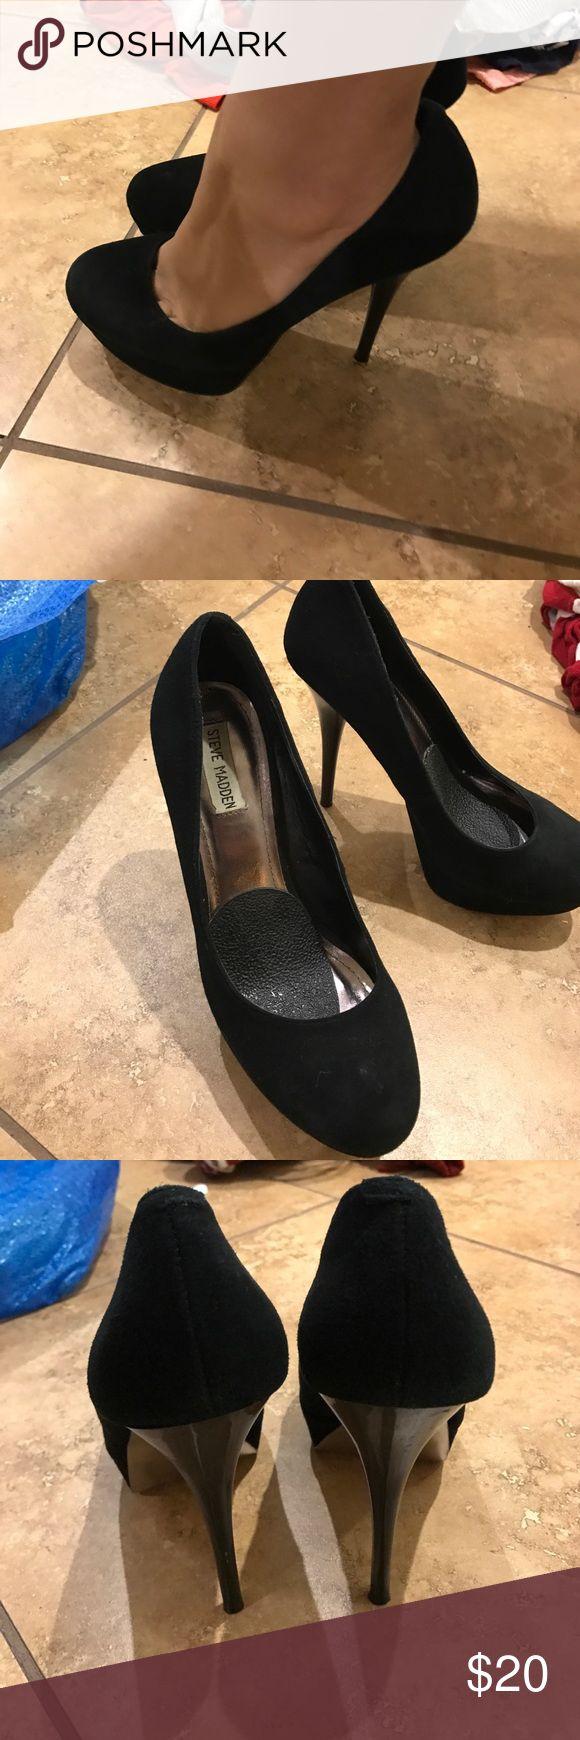 Steve Madden high heels black 6in velvet heels. Comfortable and easy to walk in Steve Madden Shoes Heels